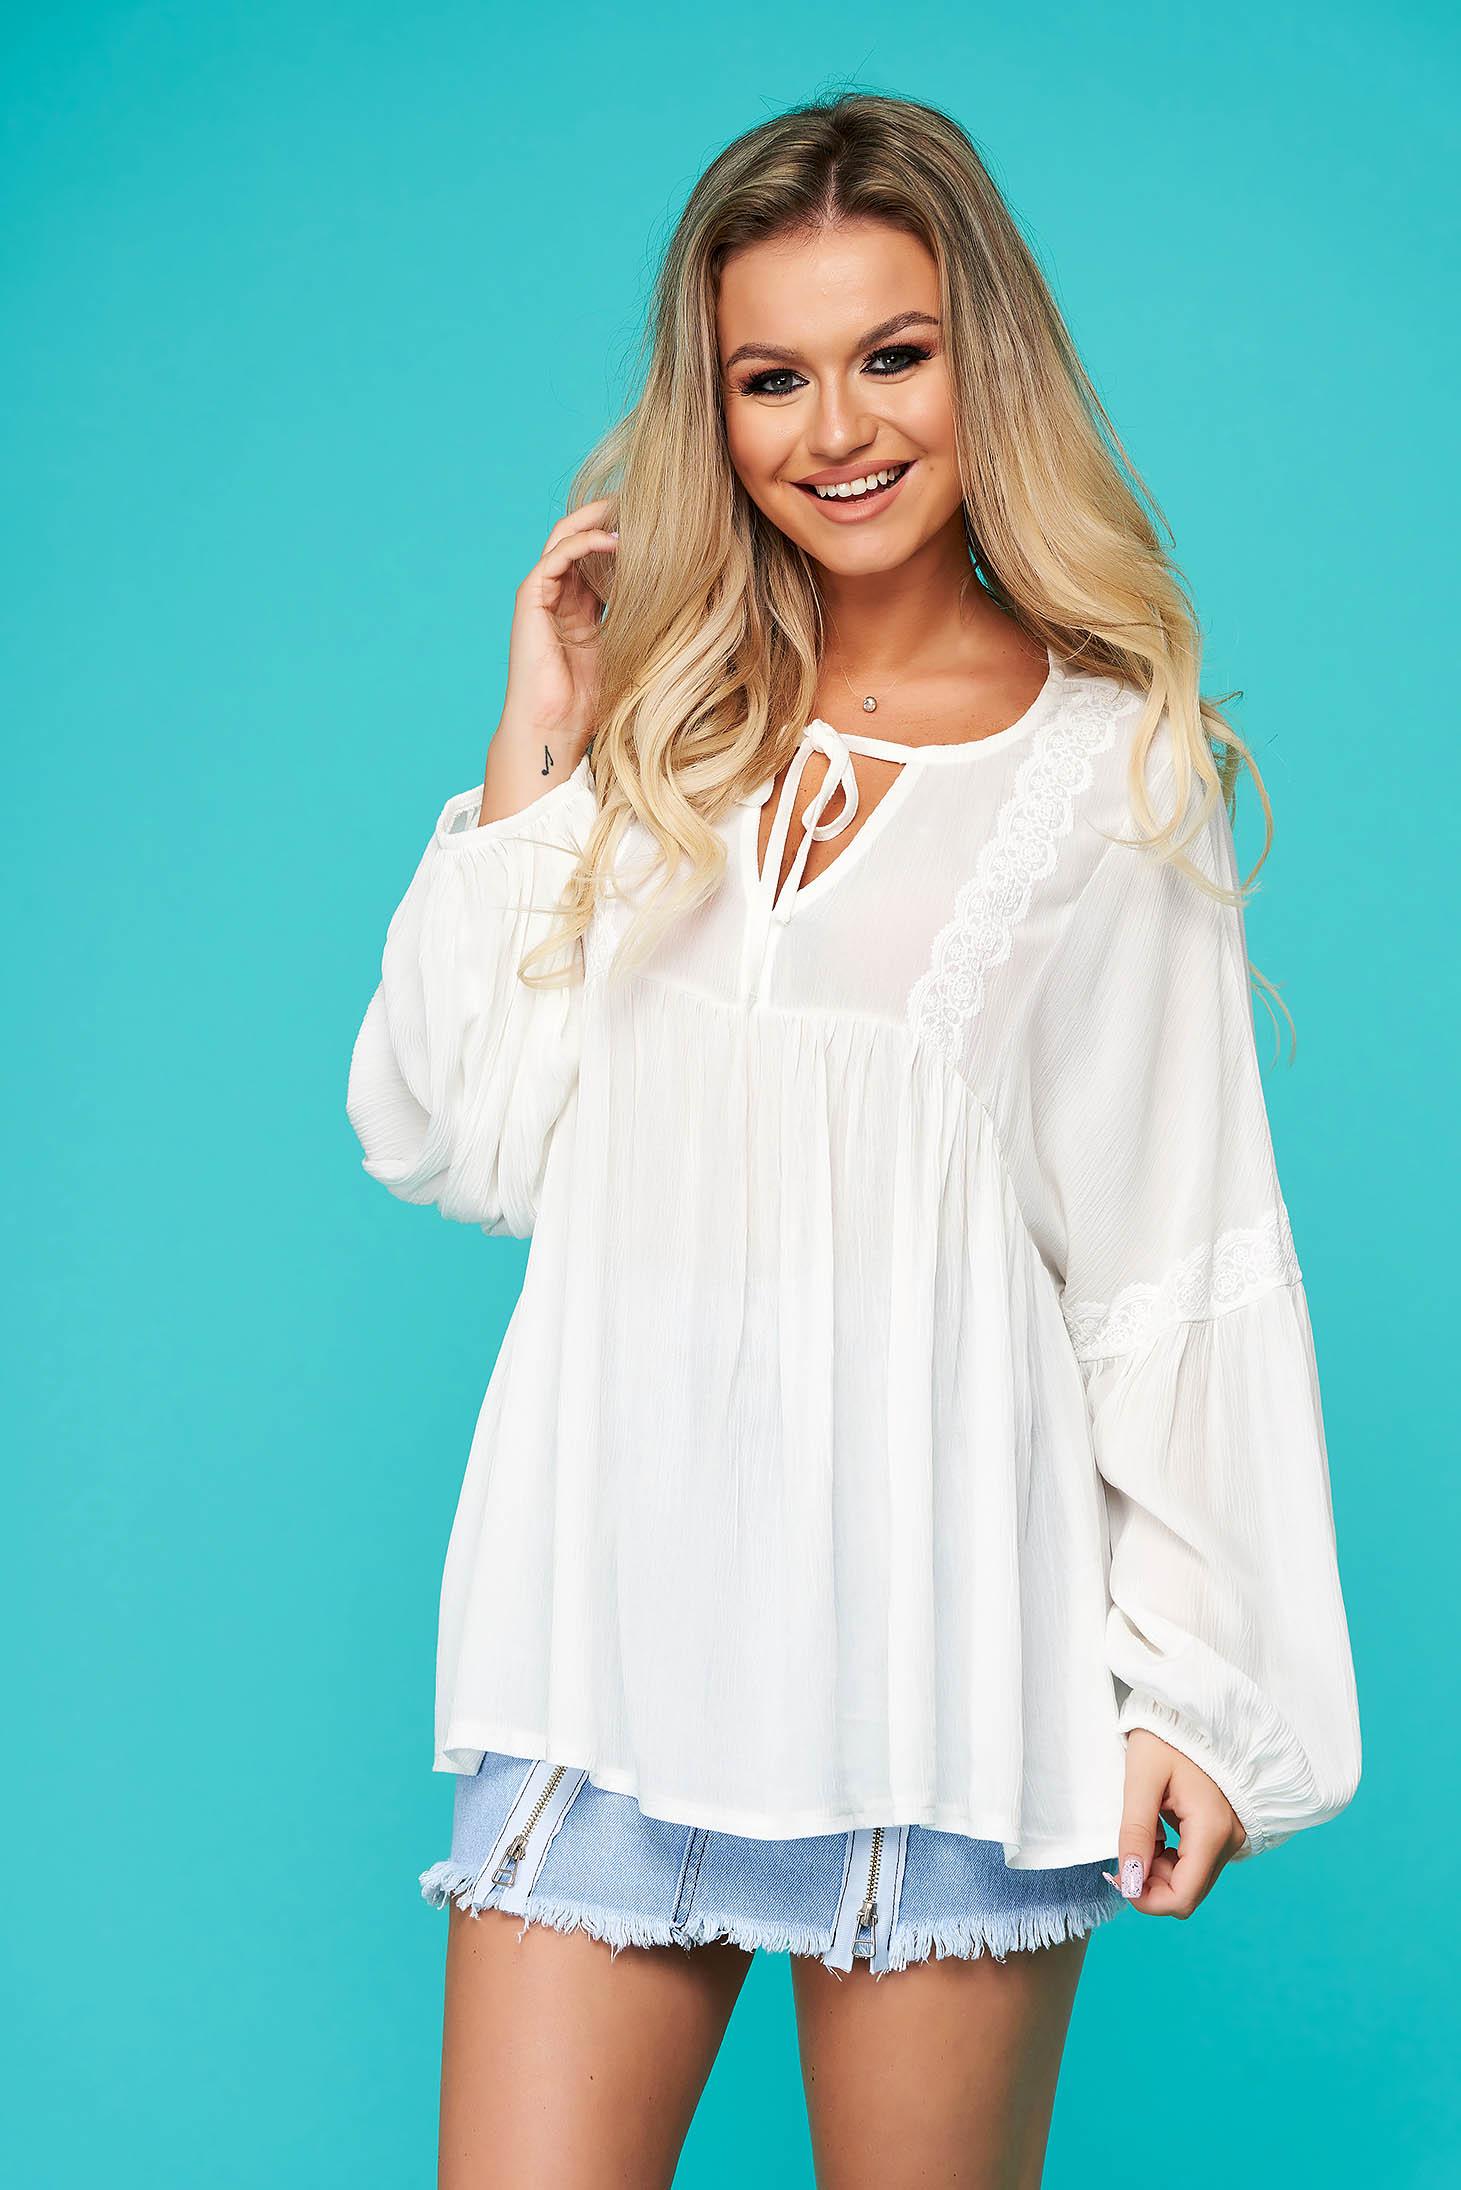 Bluza dama Top Secret alba casual cu croi larg cu aplicatii din ghipură si maneci lungi